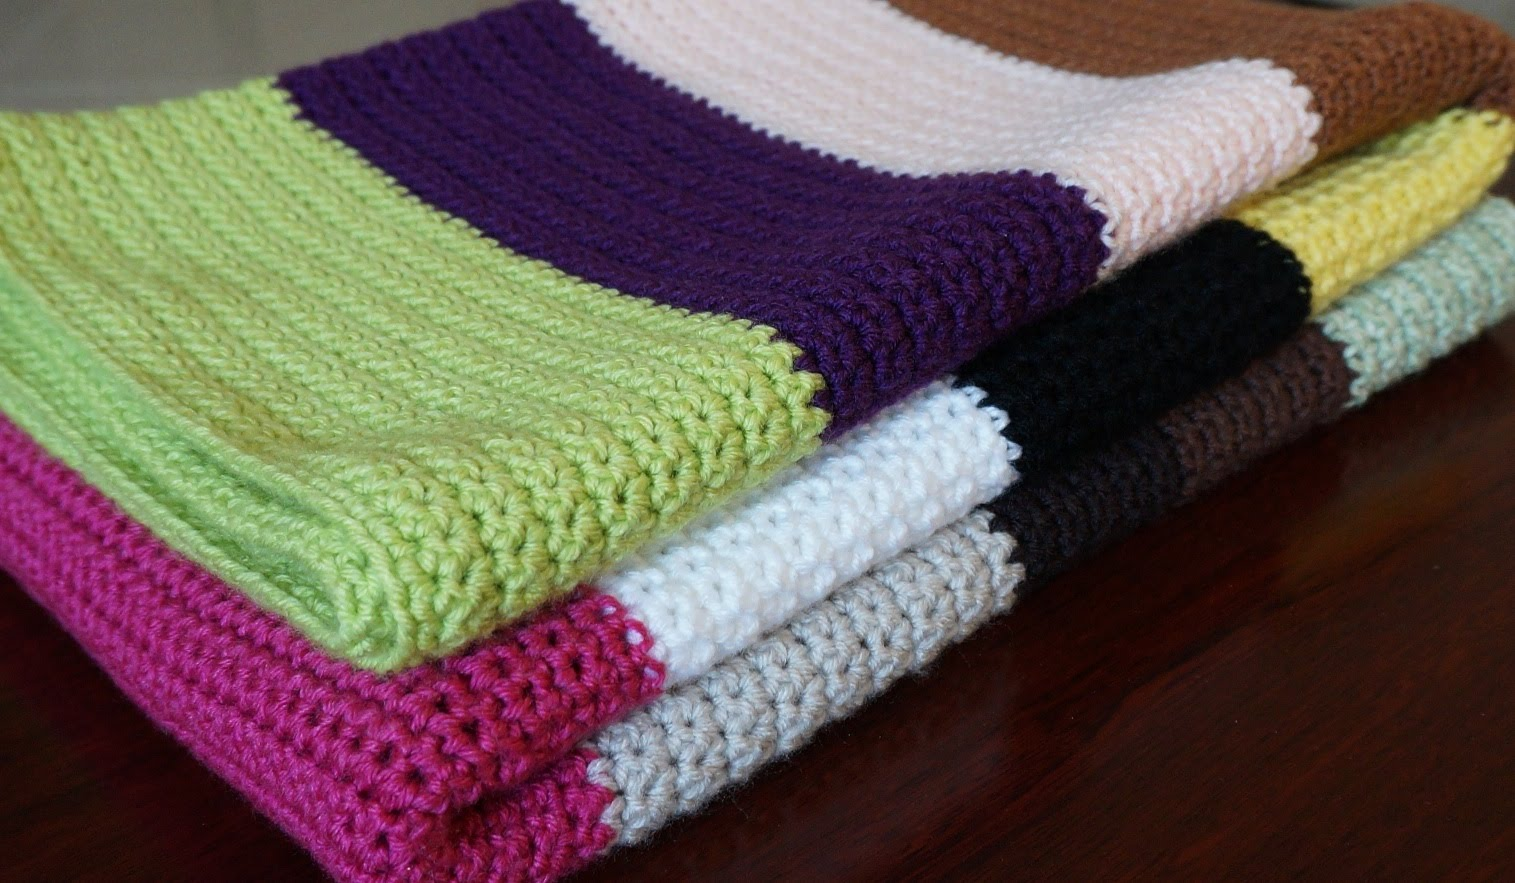 How To Crochet A Blanket single crochet blanket - youtube yskugtj